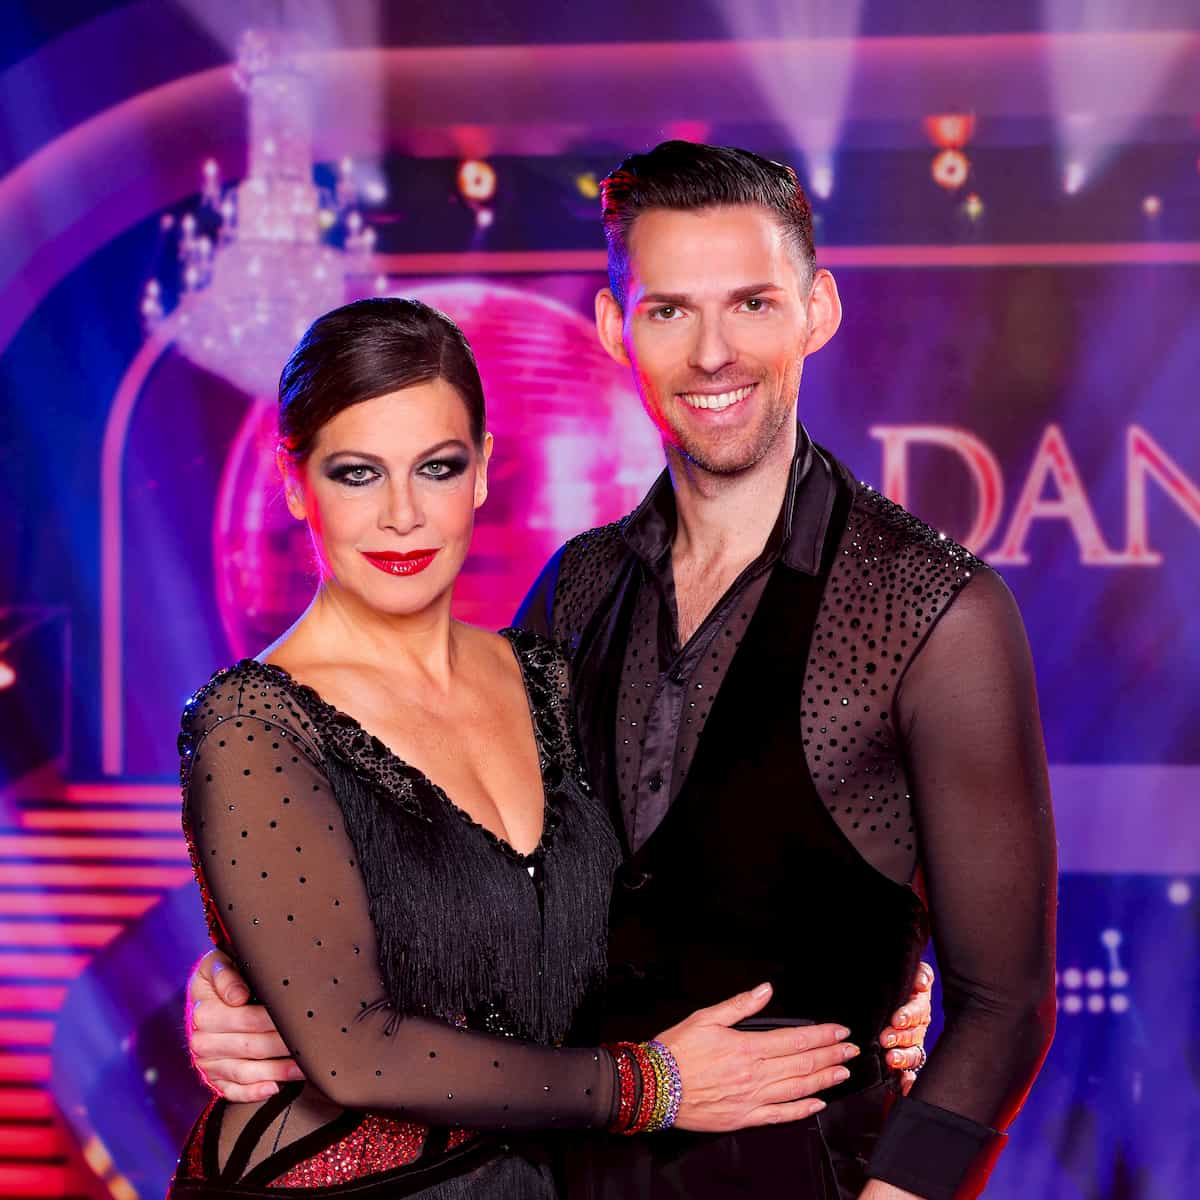 Natalia Ushakova - Stefan Herzog bei den Dancing Stars am 6.11.2020